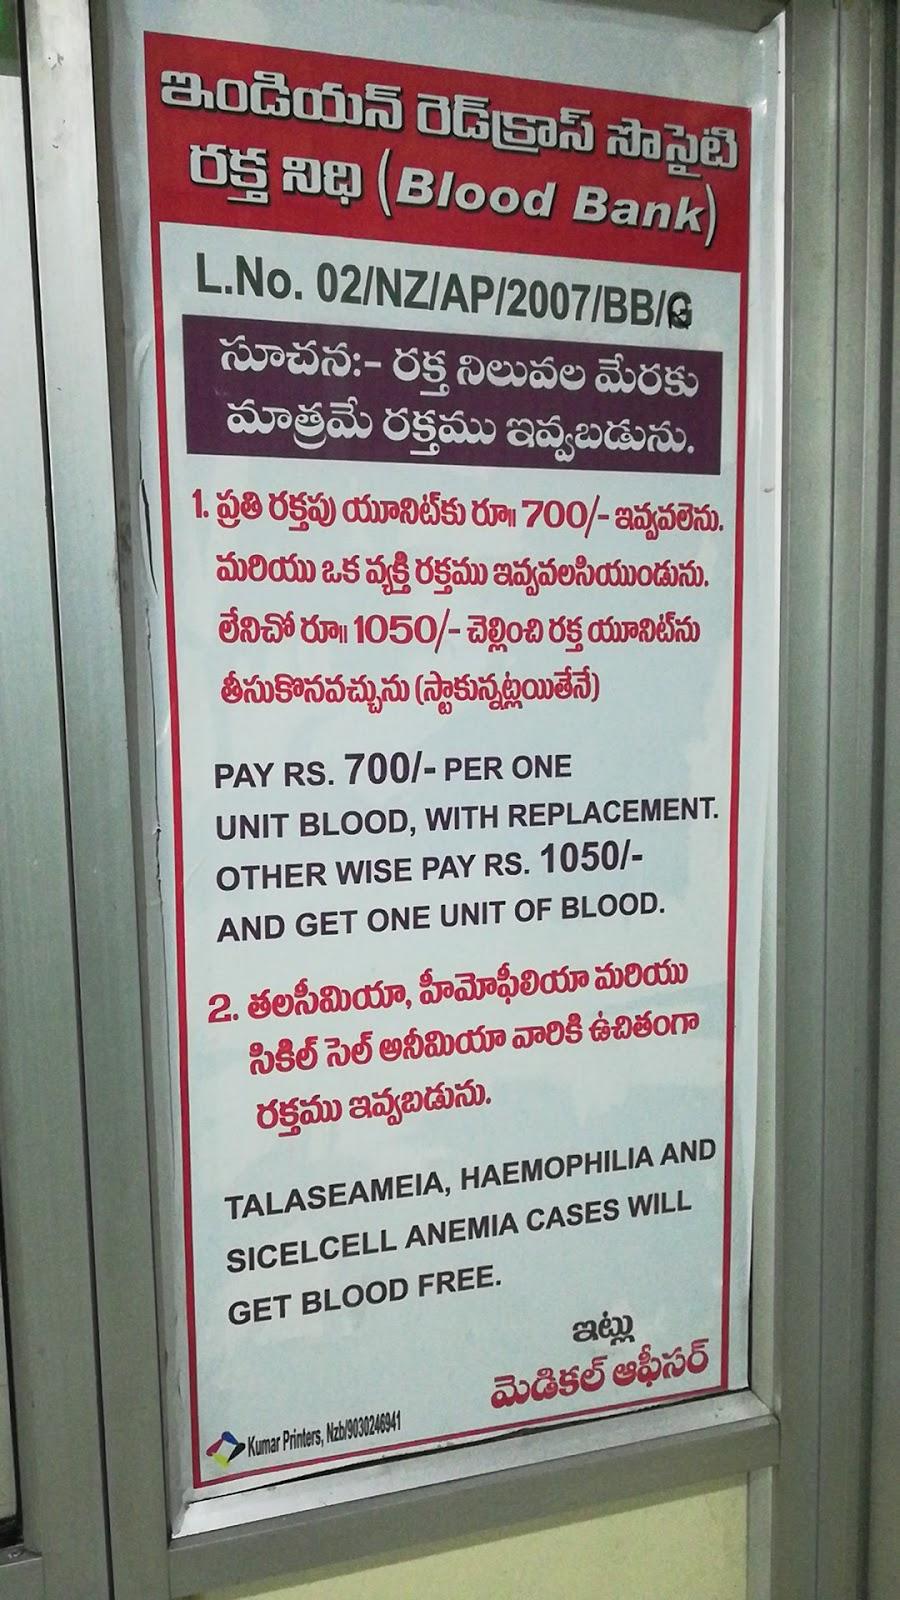 blood bank Red Cross Blood Bank near Nizamabad Telangana